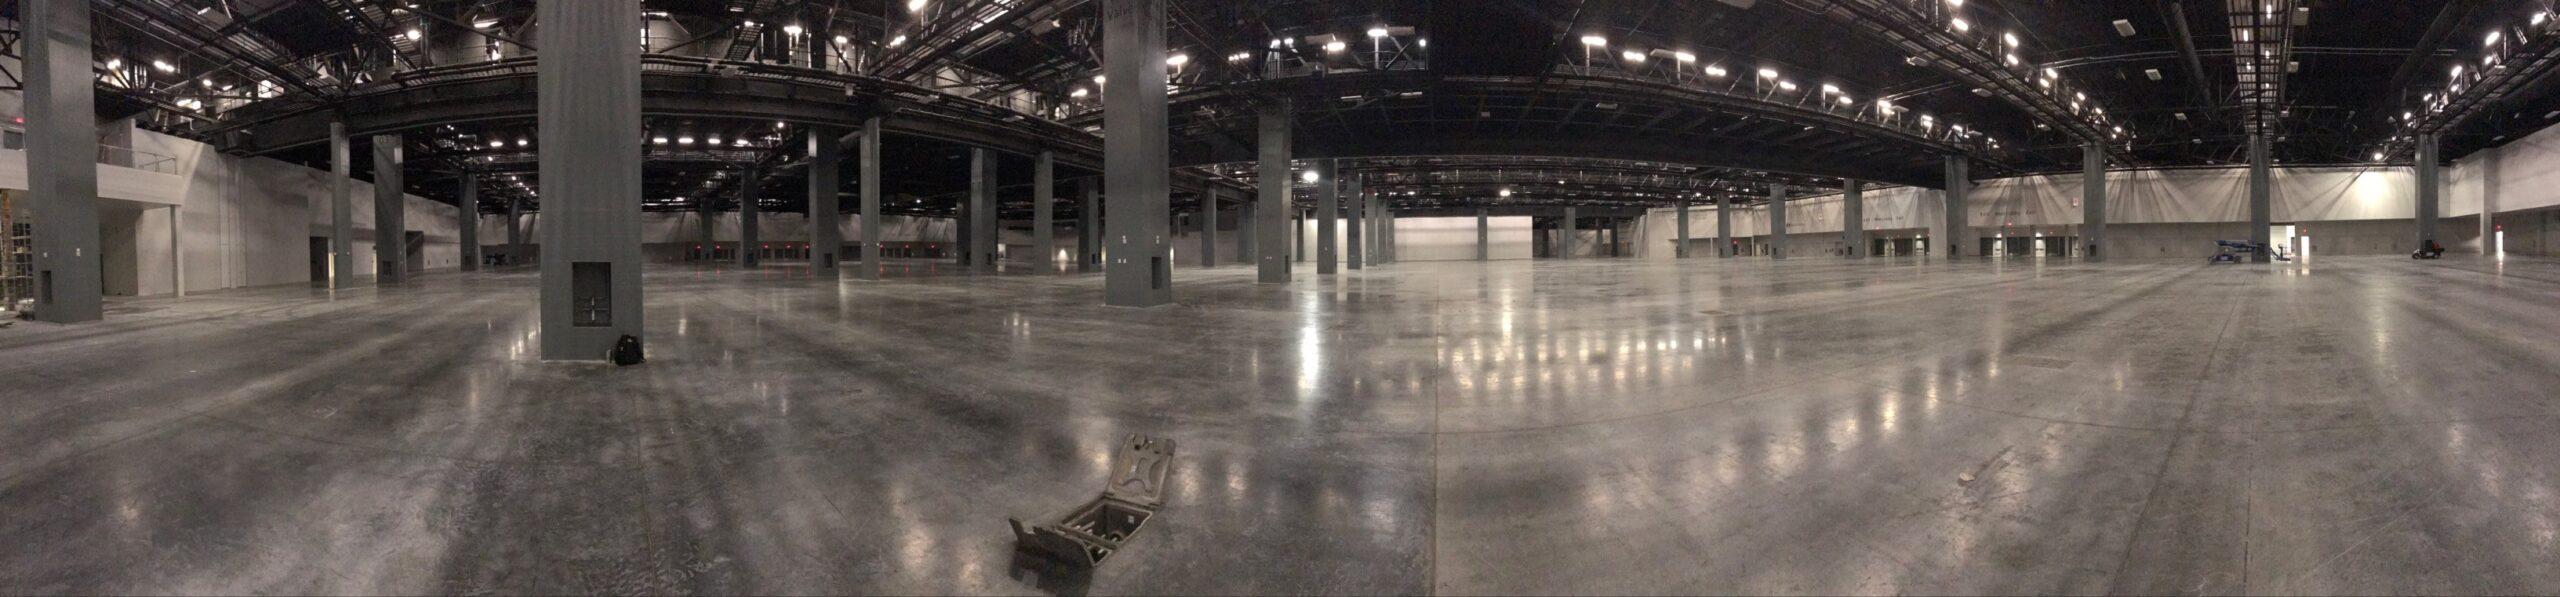 empty convention center